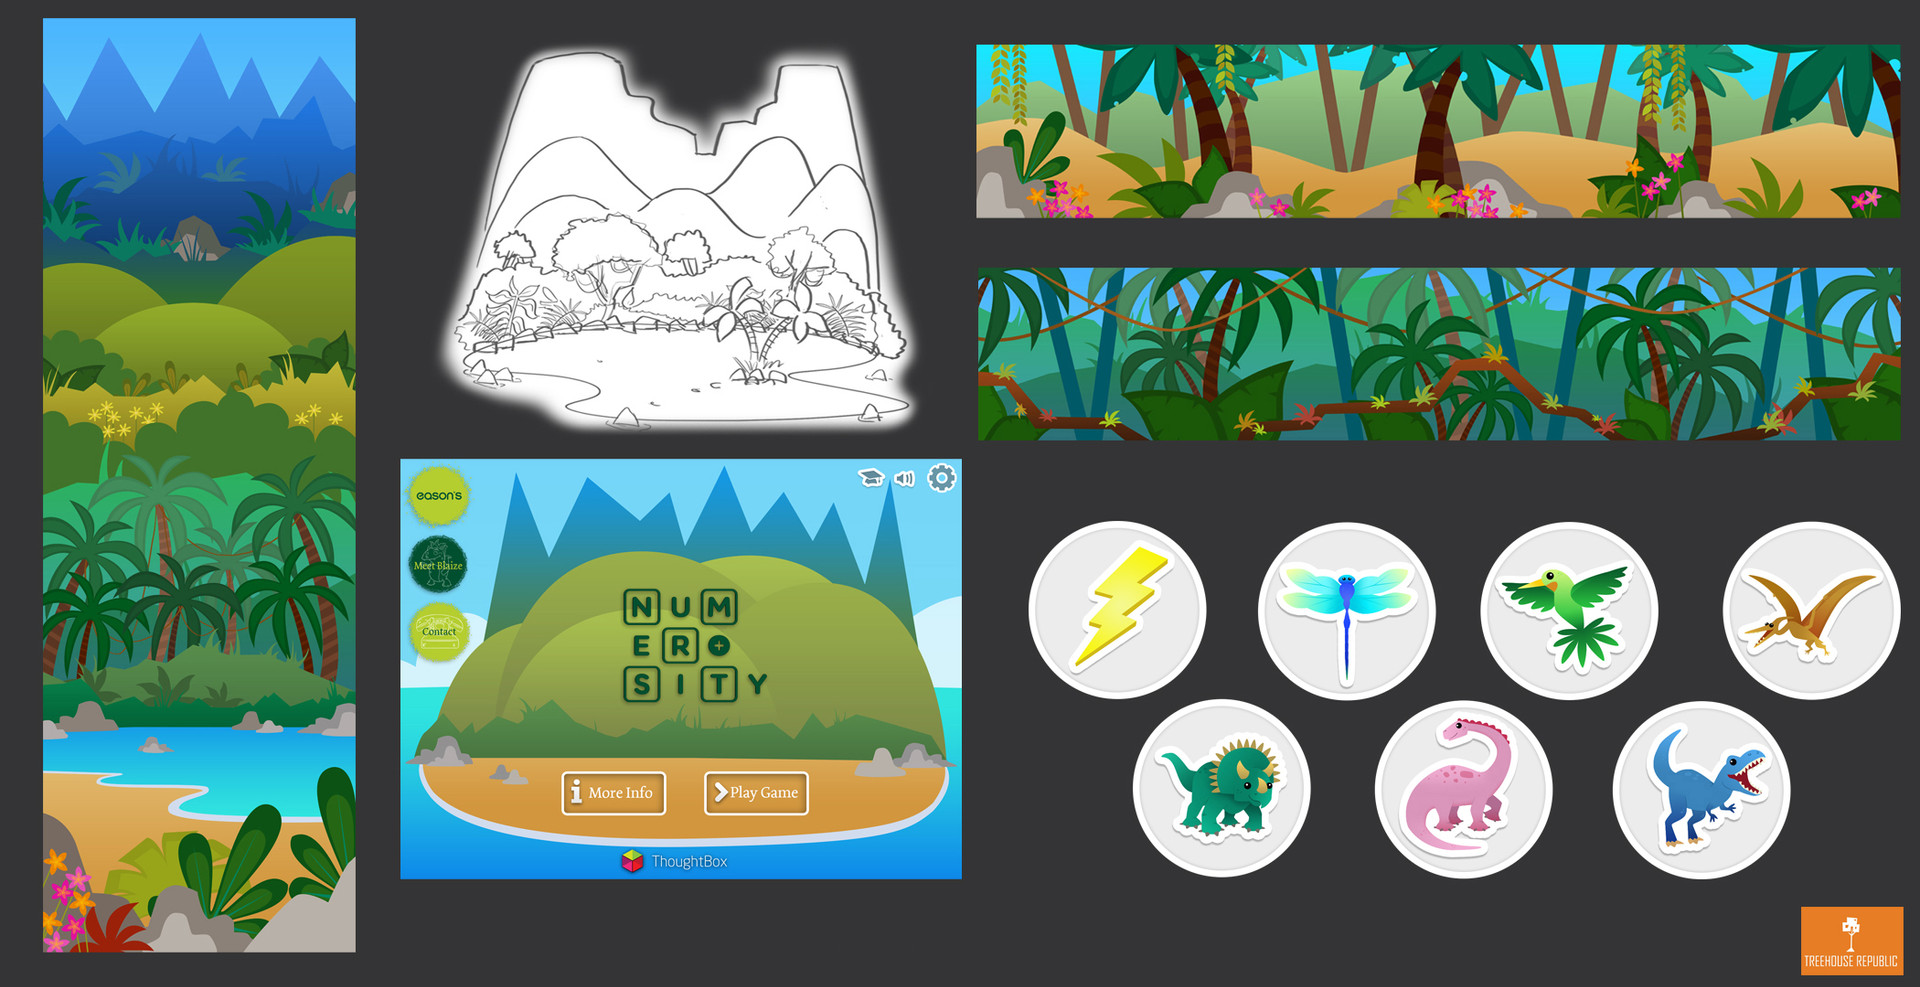 Game Art & Concepts- 'Numerosity'